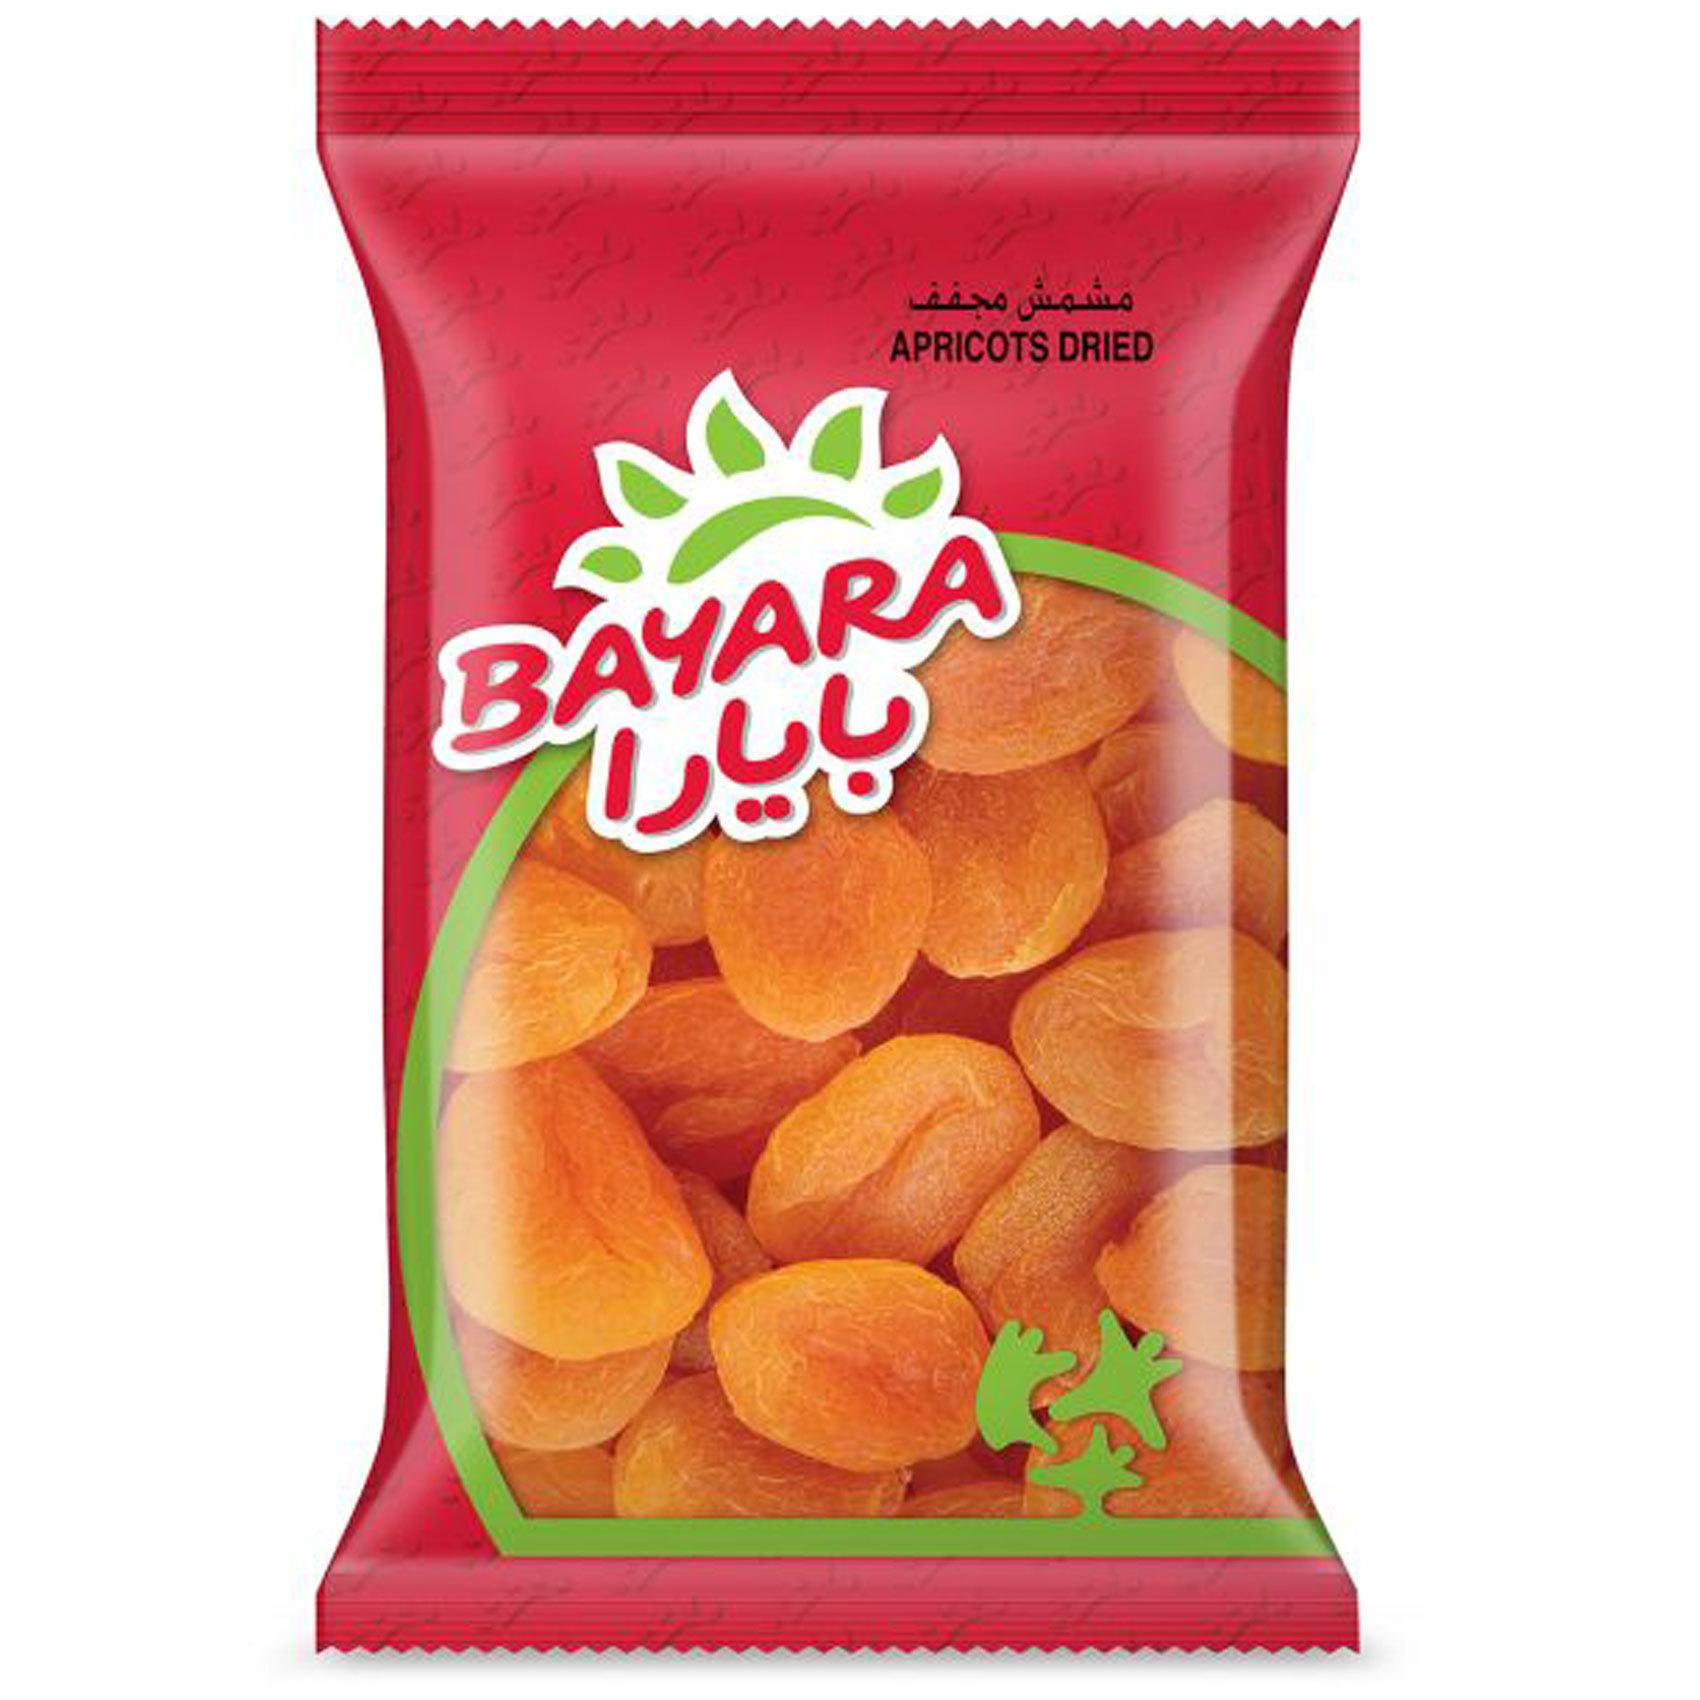 BAYARA APRICOTS DRIED 400GR